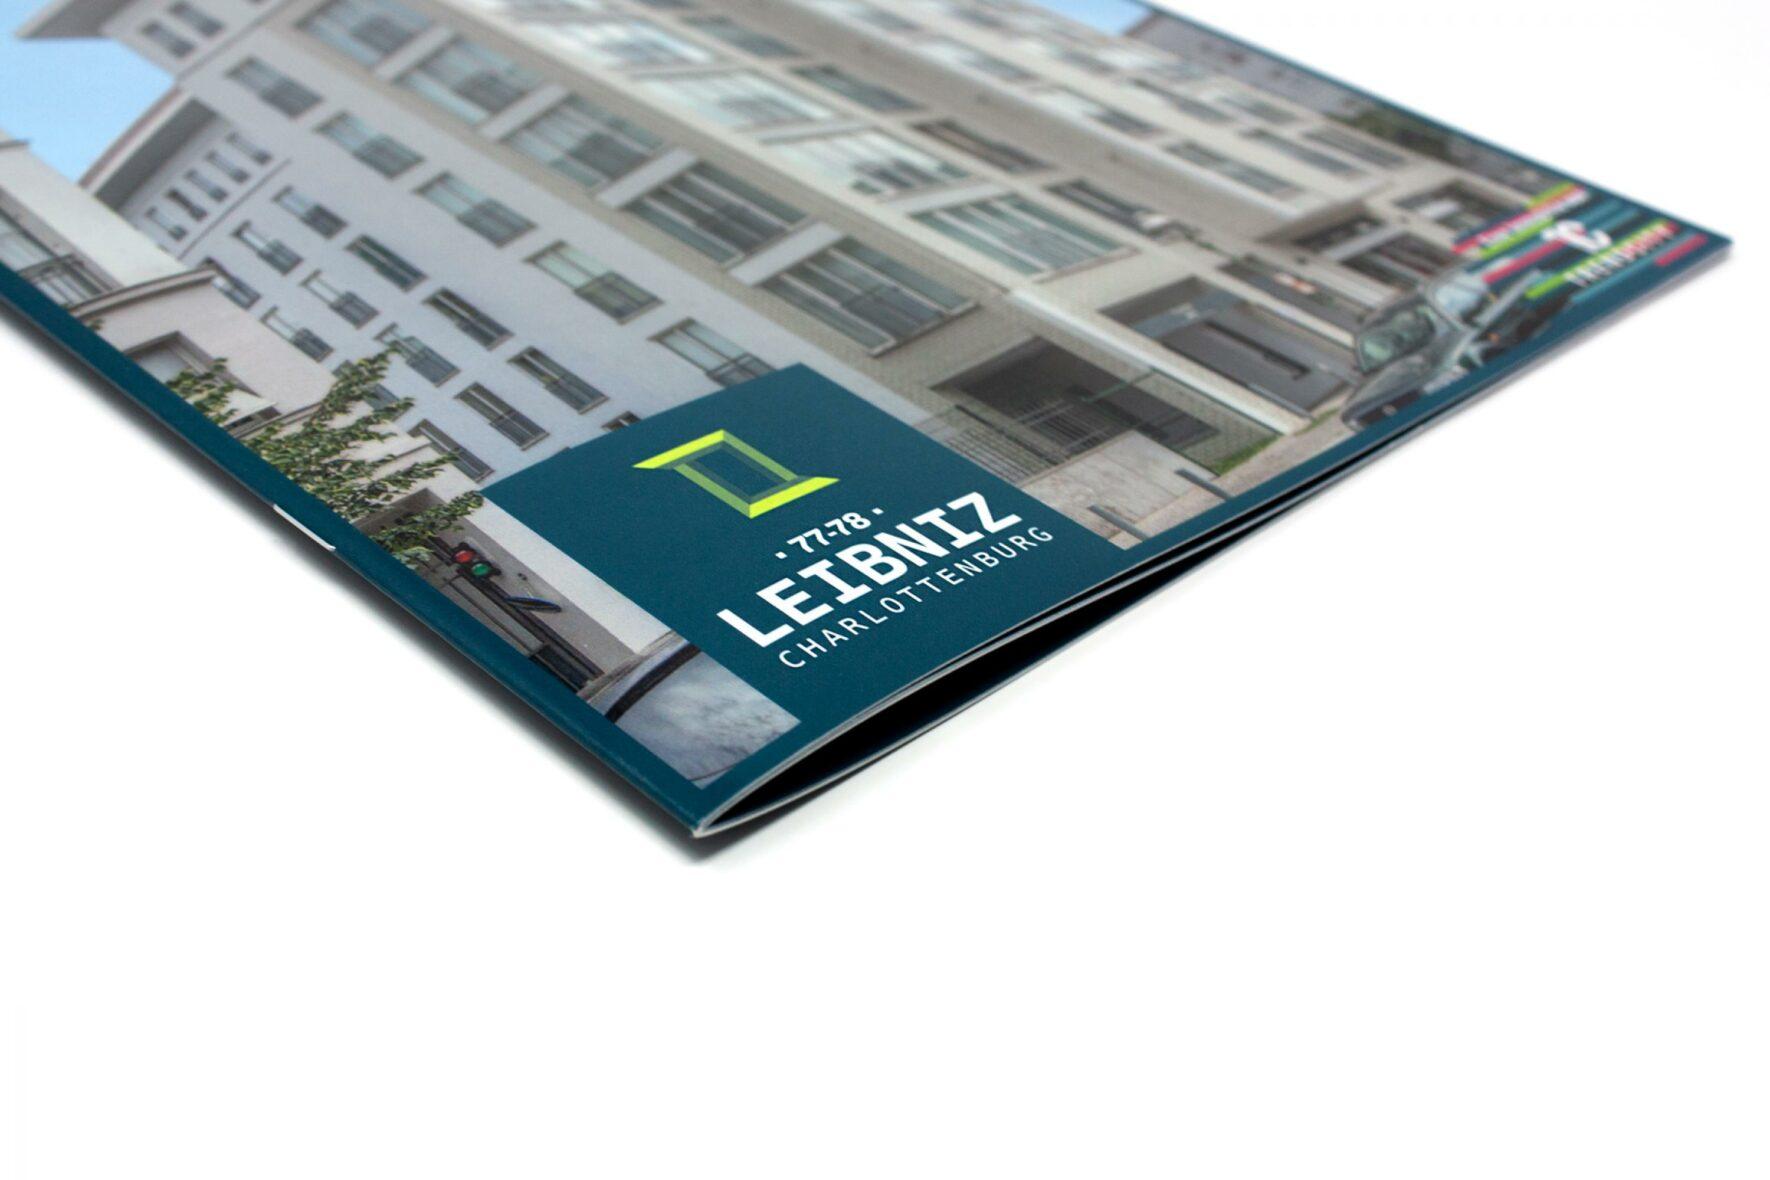 Broschuere-Leibniz-Immobilienbranding-Trendcity-FORMLOS-berlin-Print30